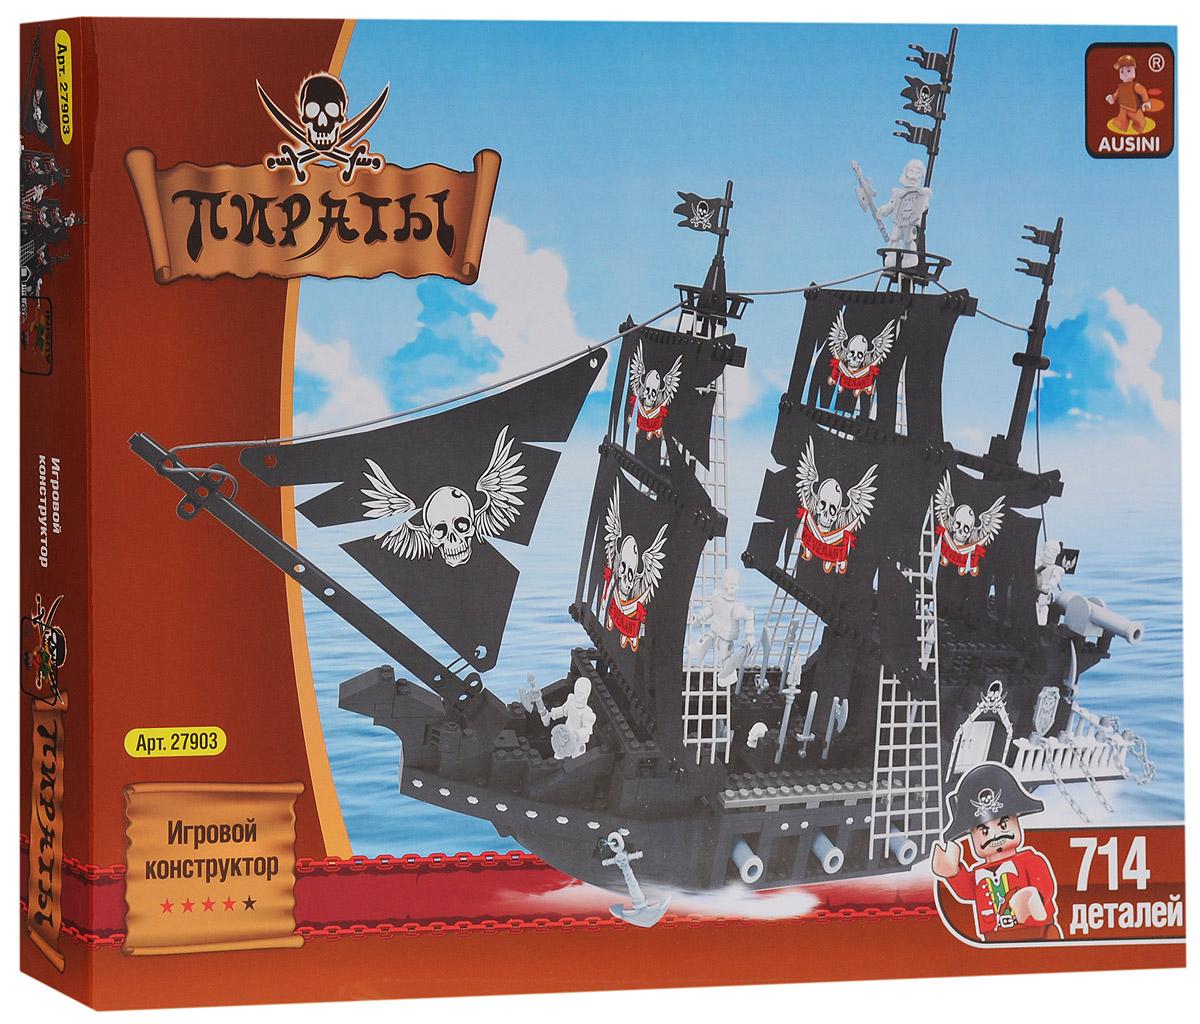 Ausini Конструктор Пиратский корабль игрушка конструктор lite brix фигурки 35853